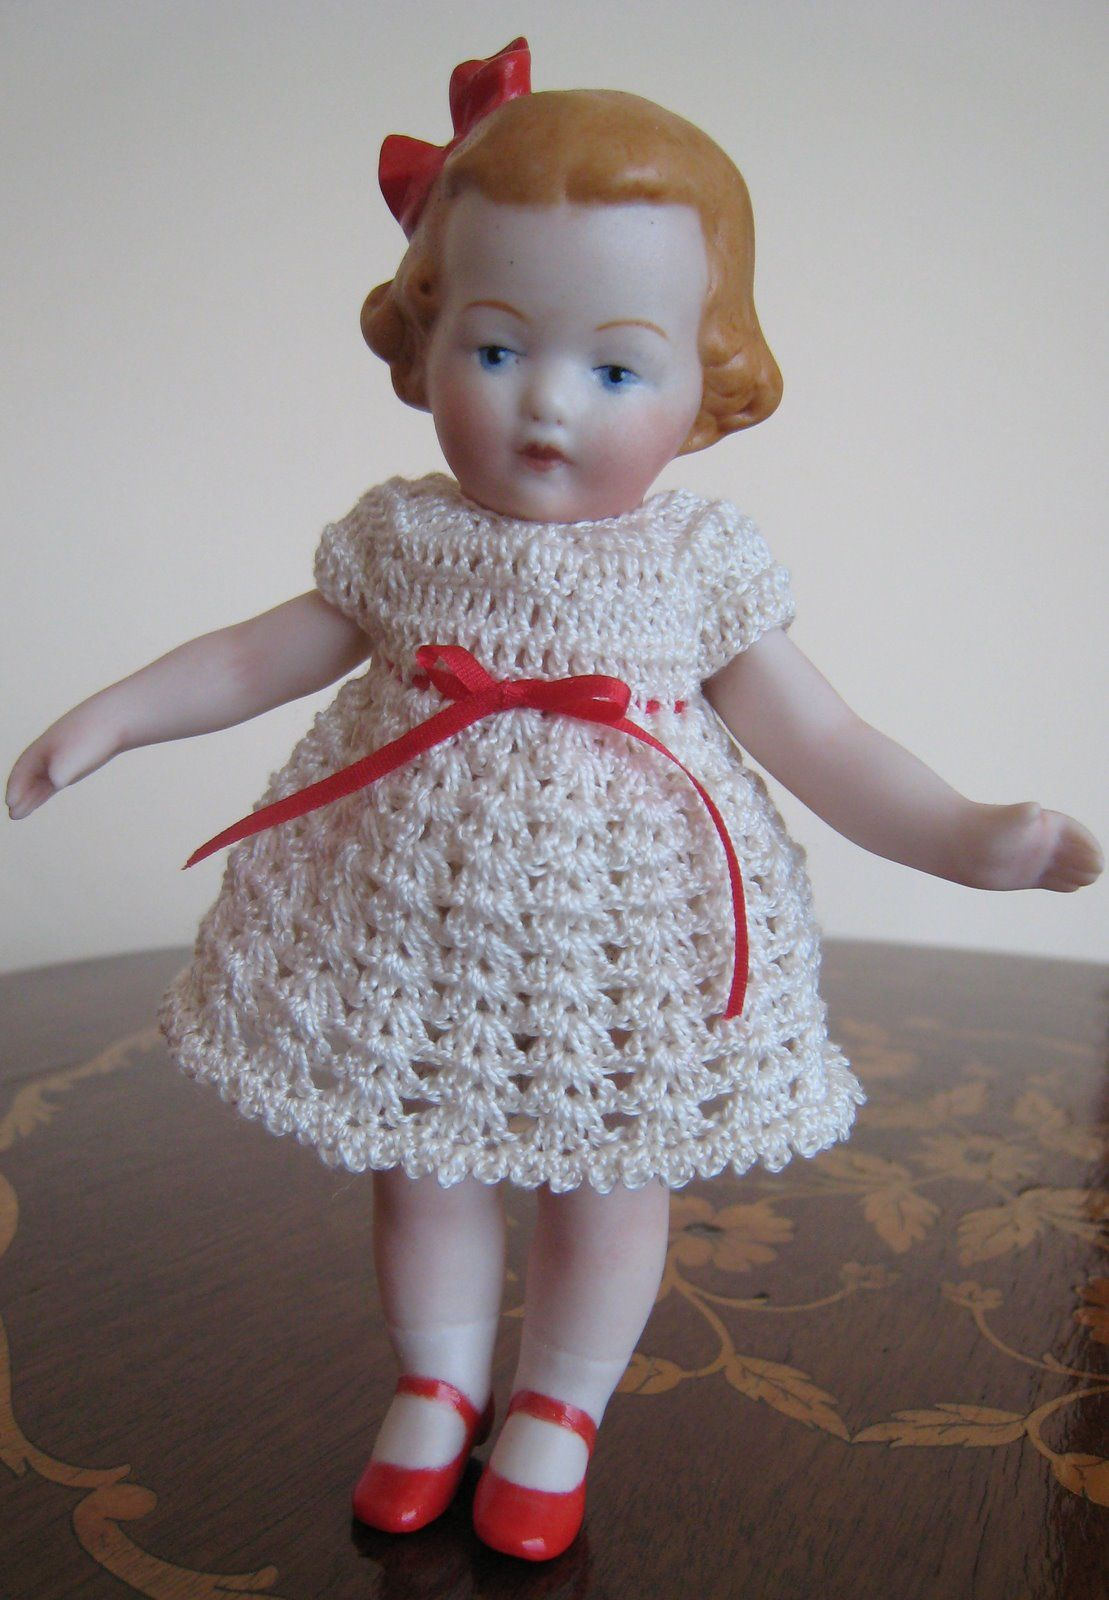 Sweet Crocheted Dress Miniature Crochet Crochet Doll